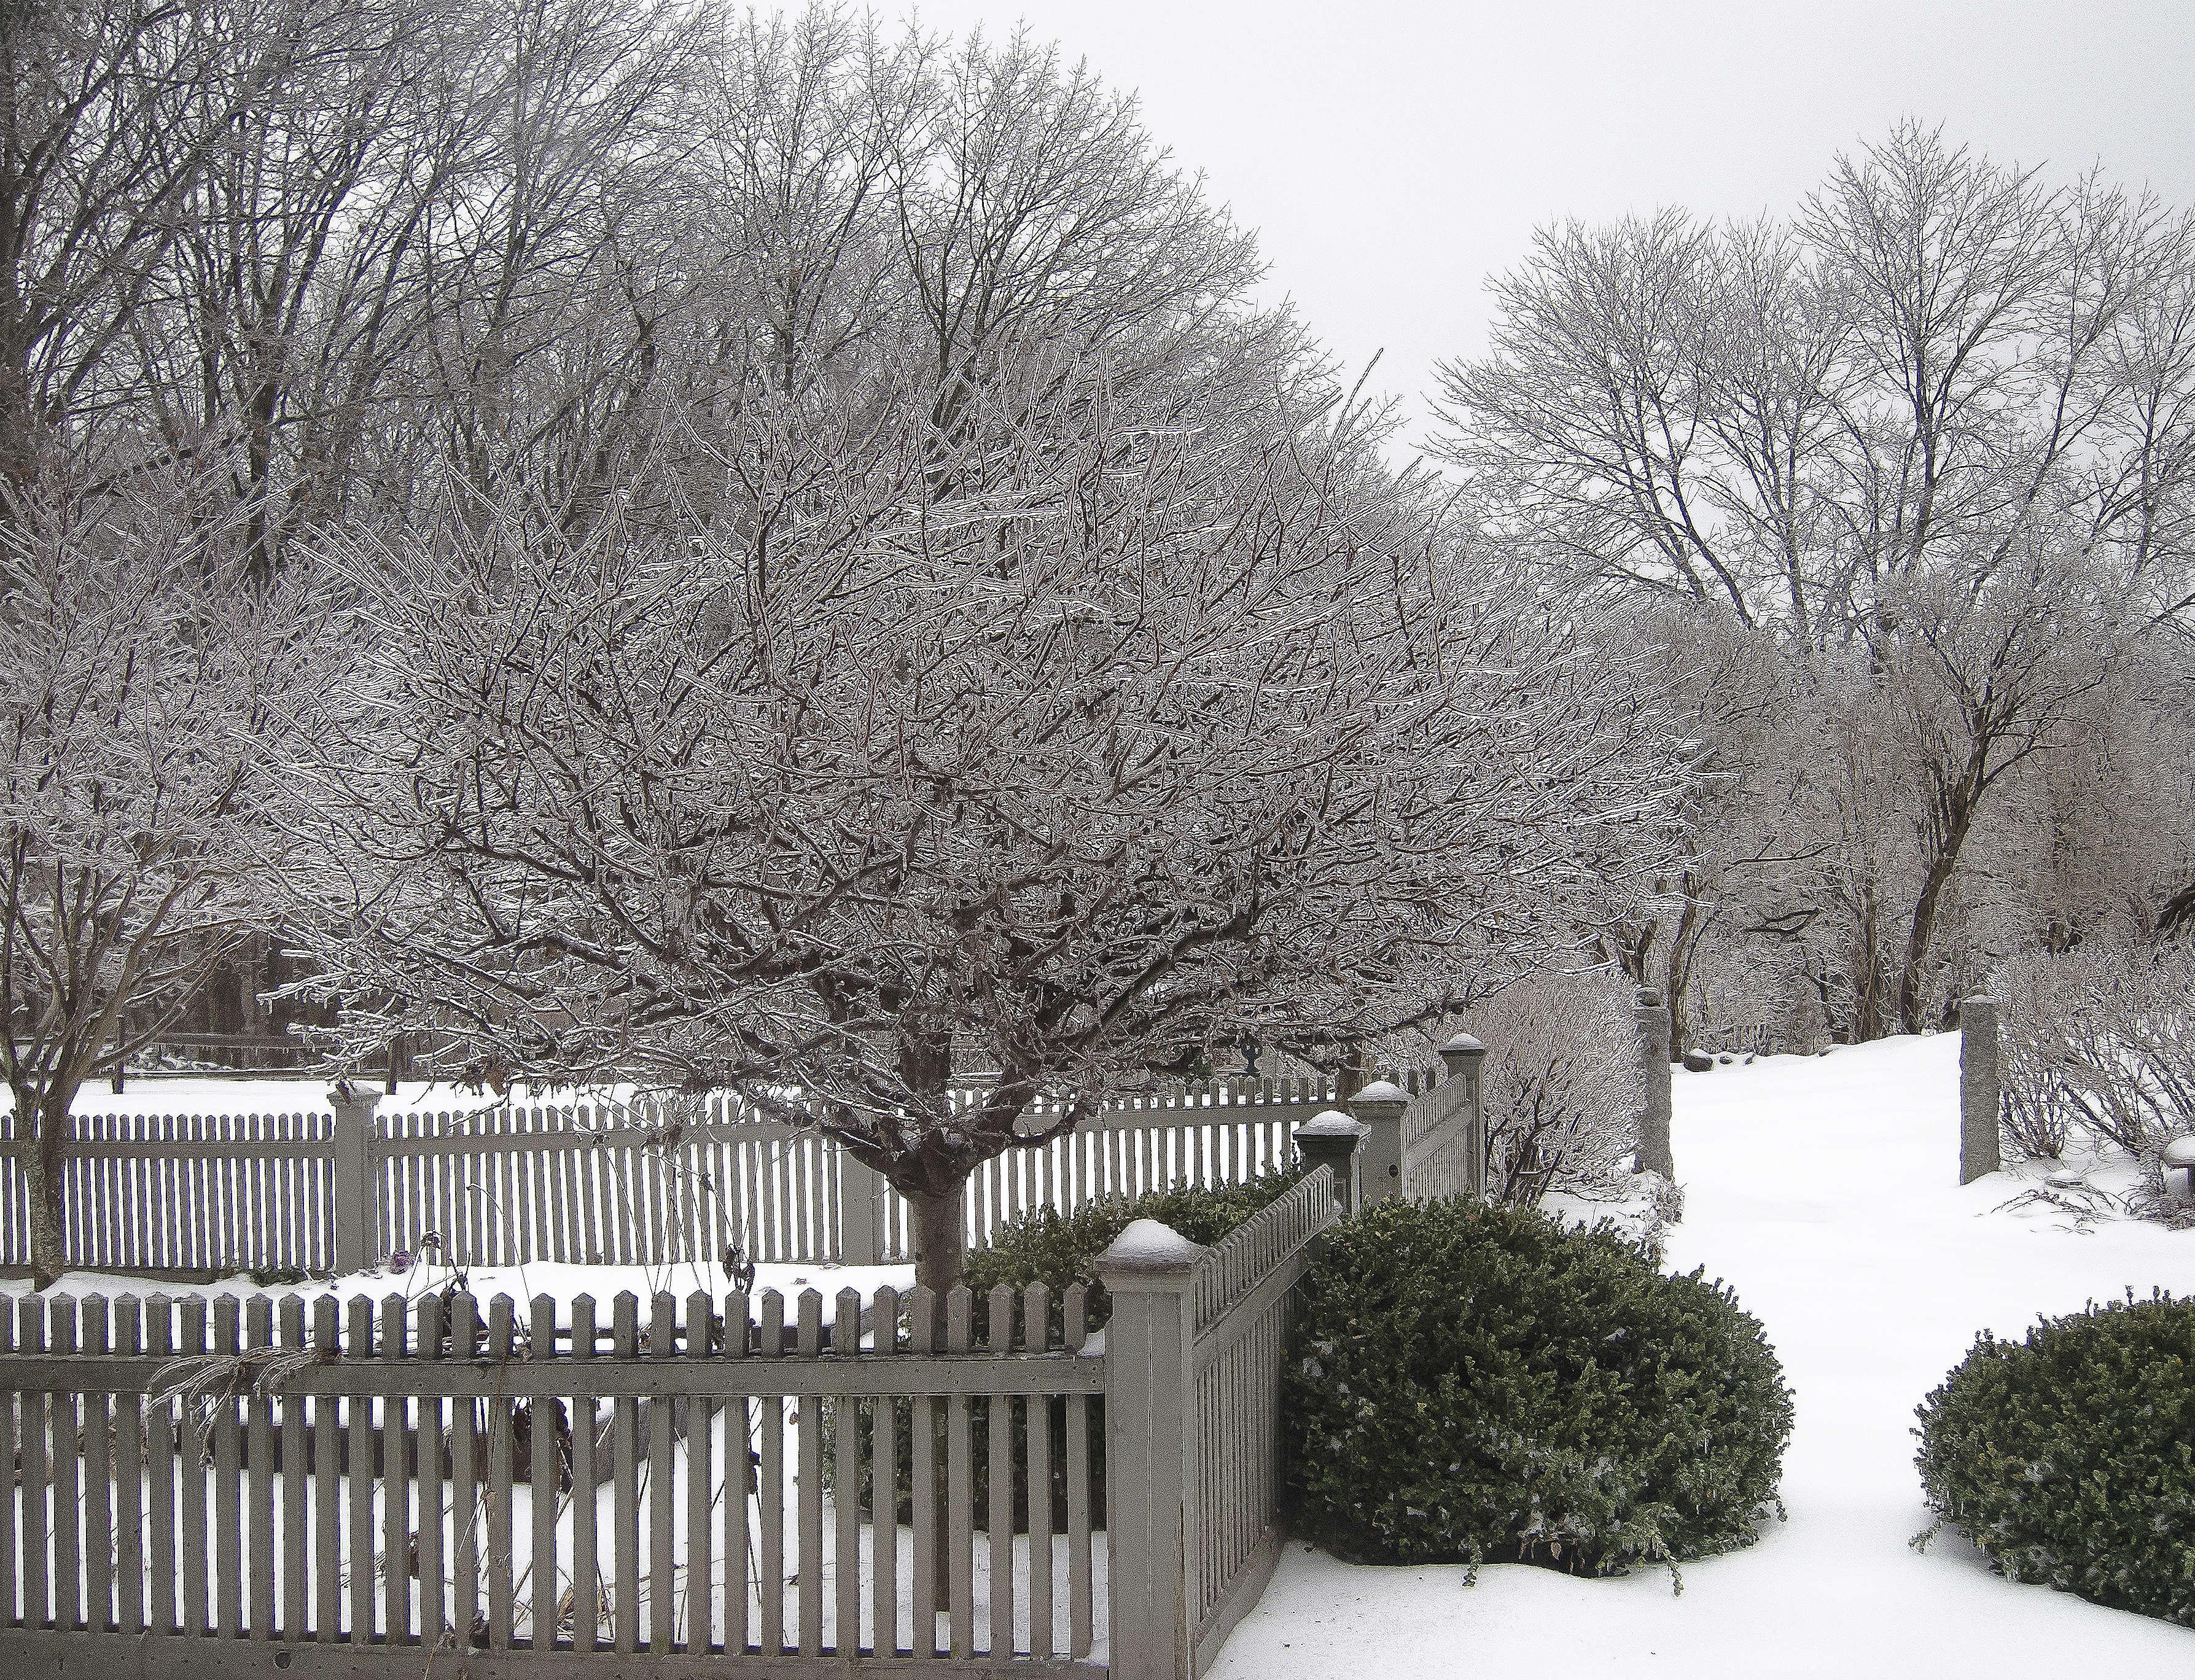 juniper-hill-winter-garden-picket-fence-snow-joseph-valentine-11